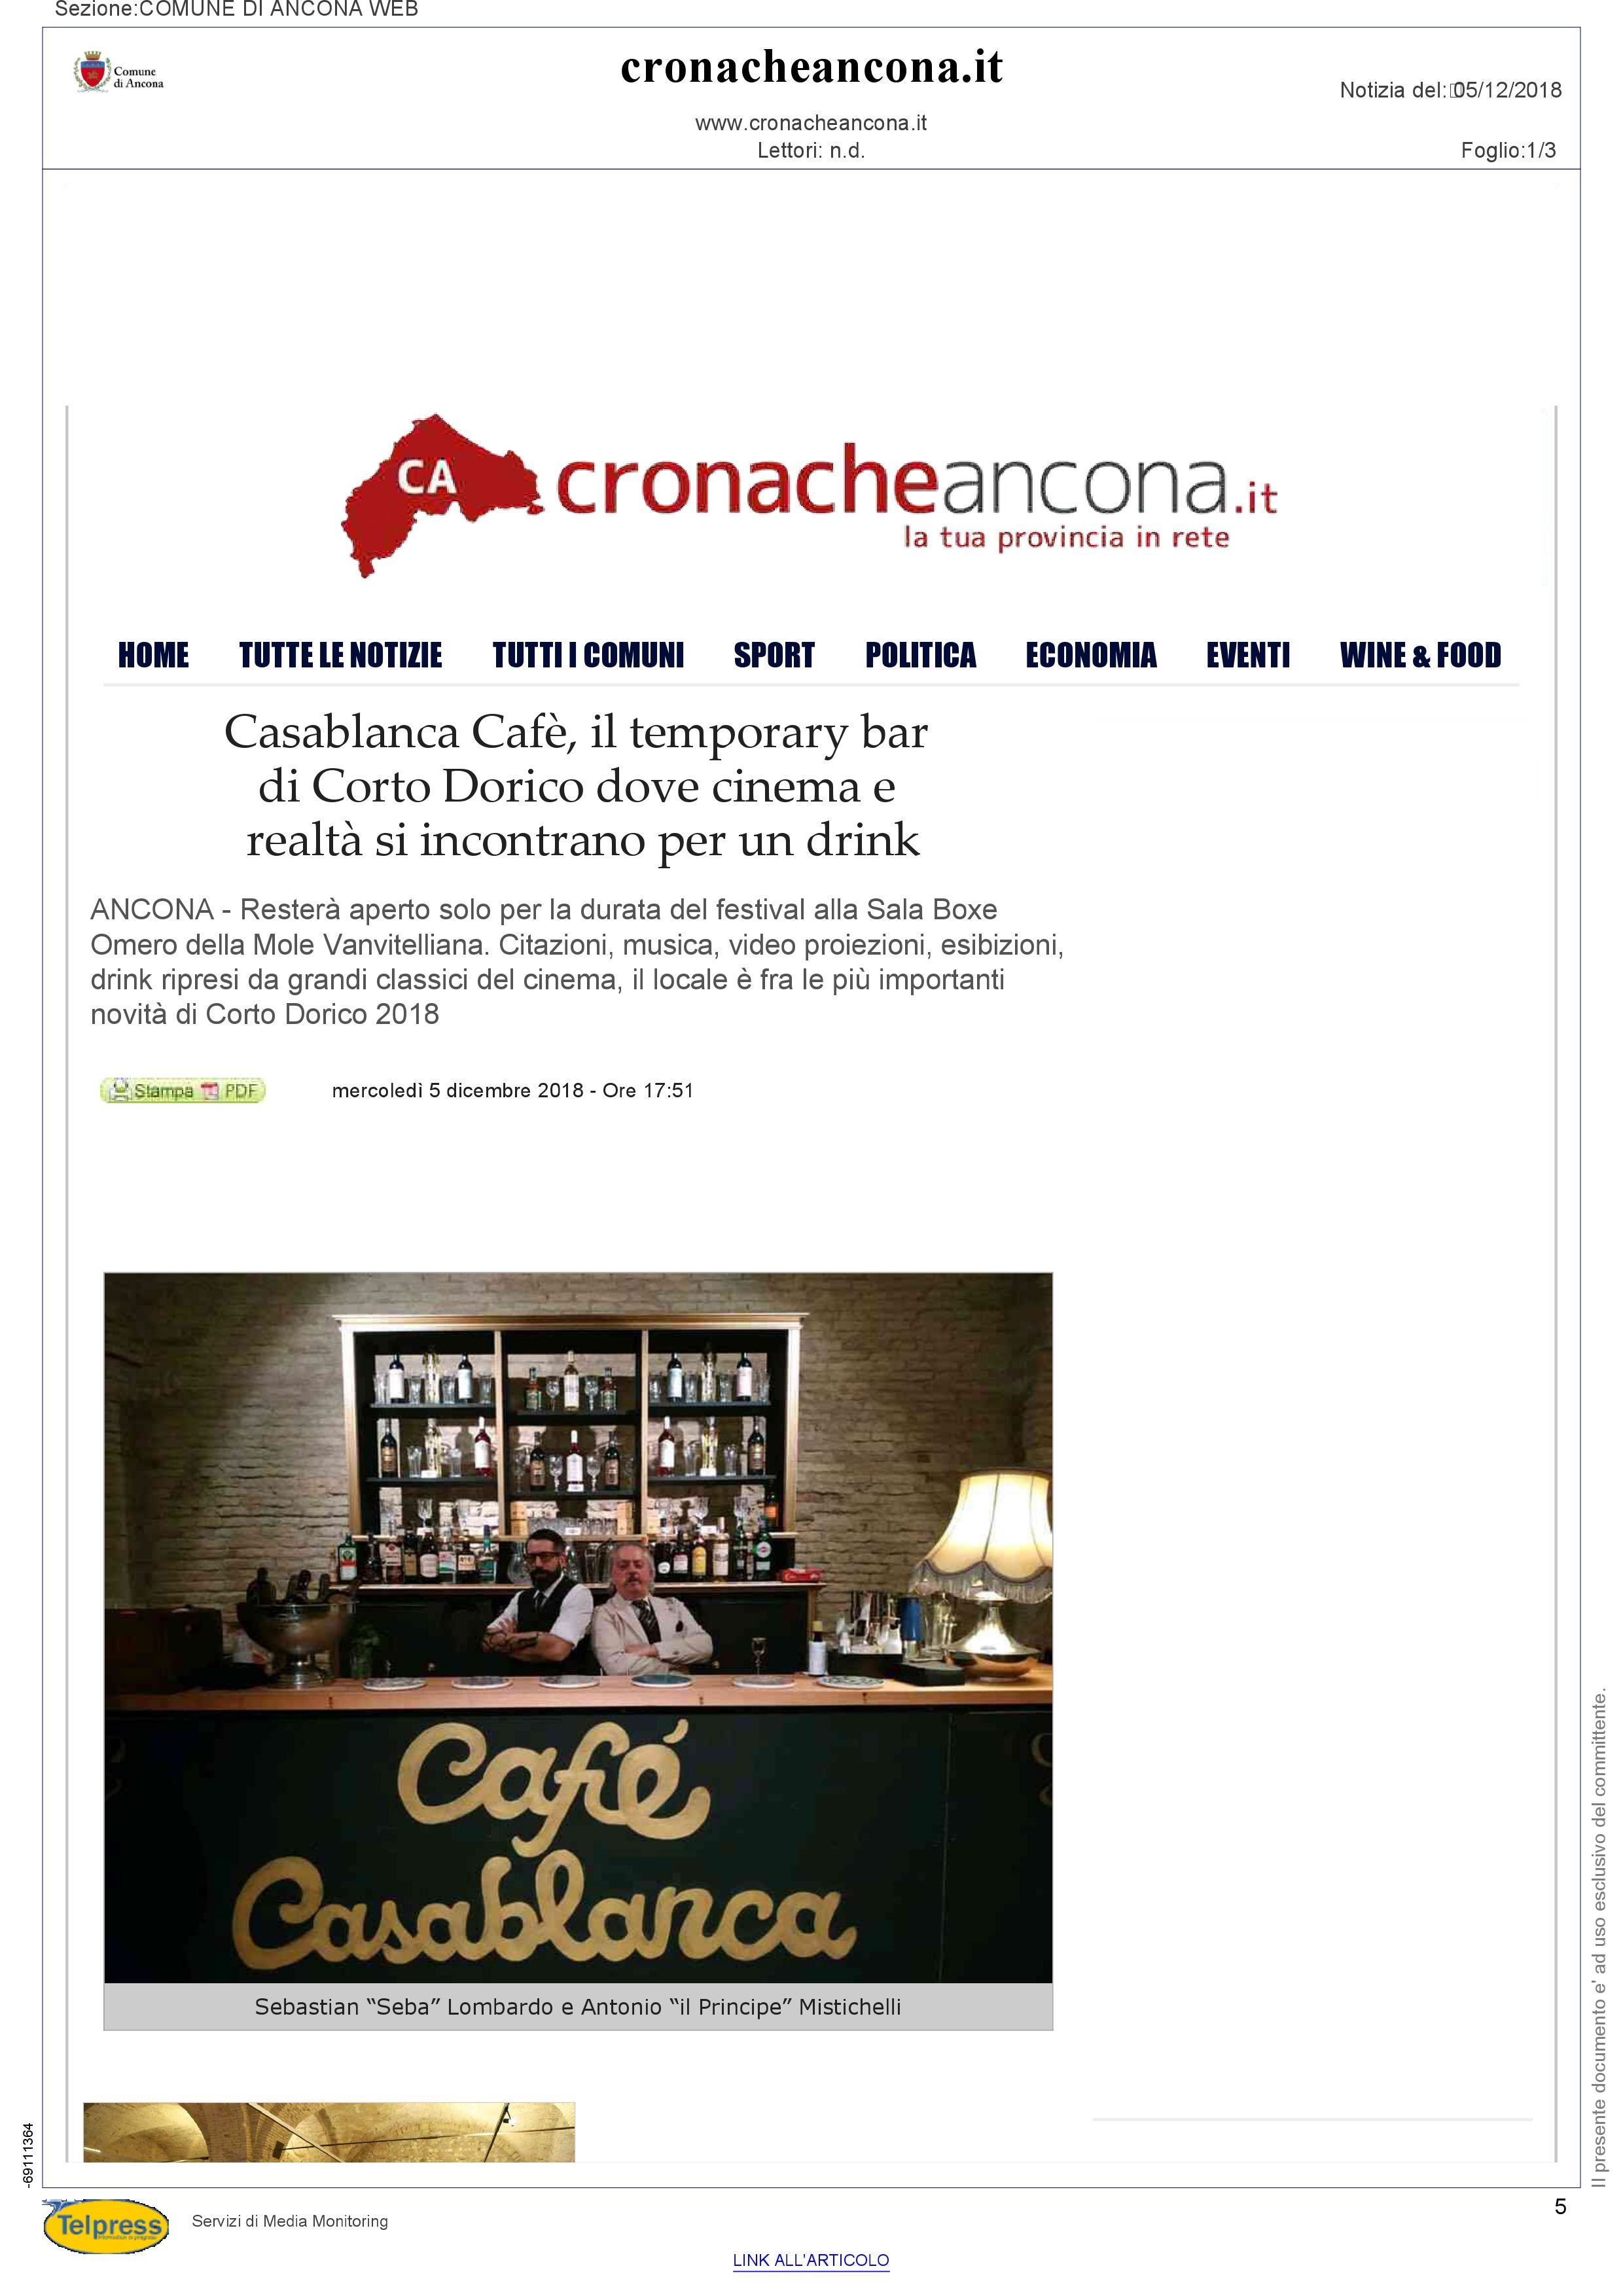 5-12-18 Cronache Ancona pag 1